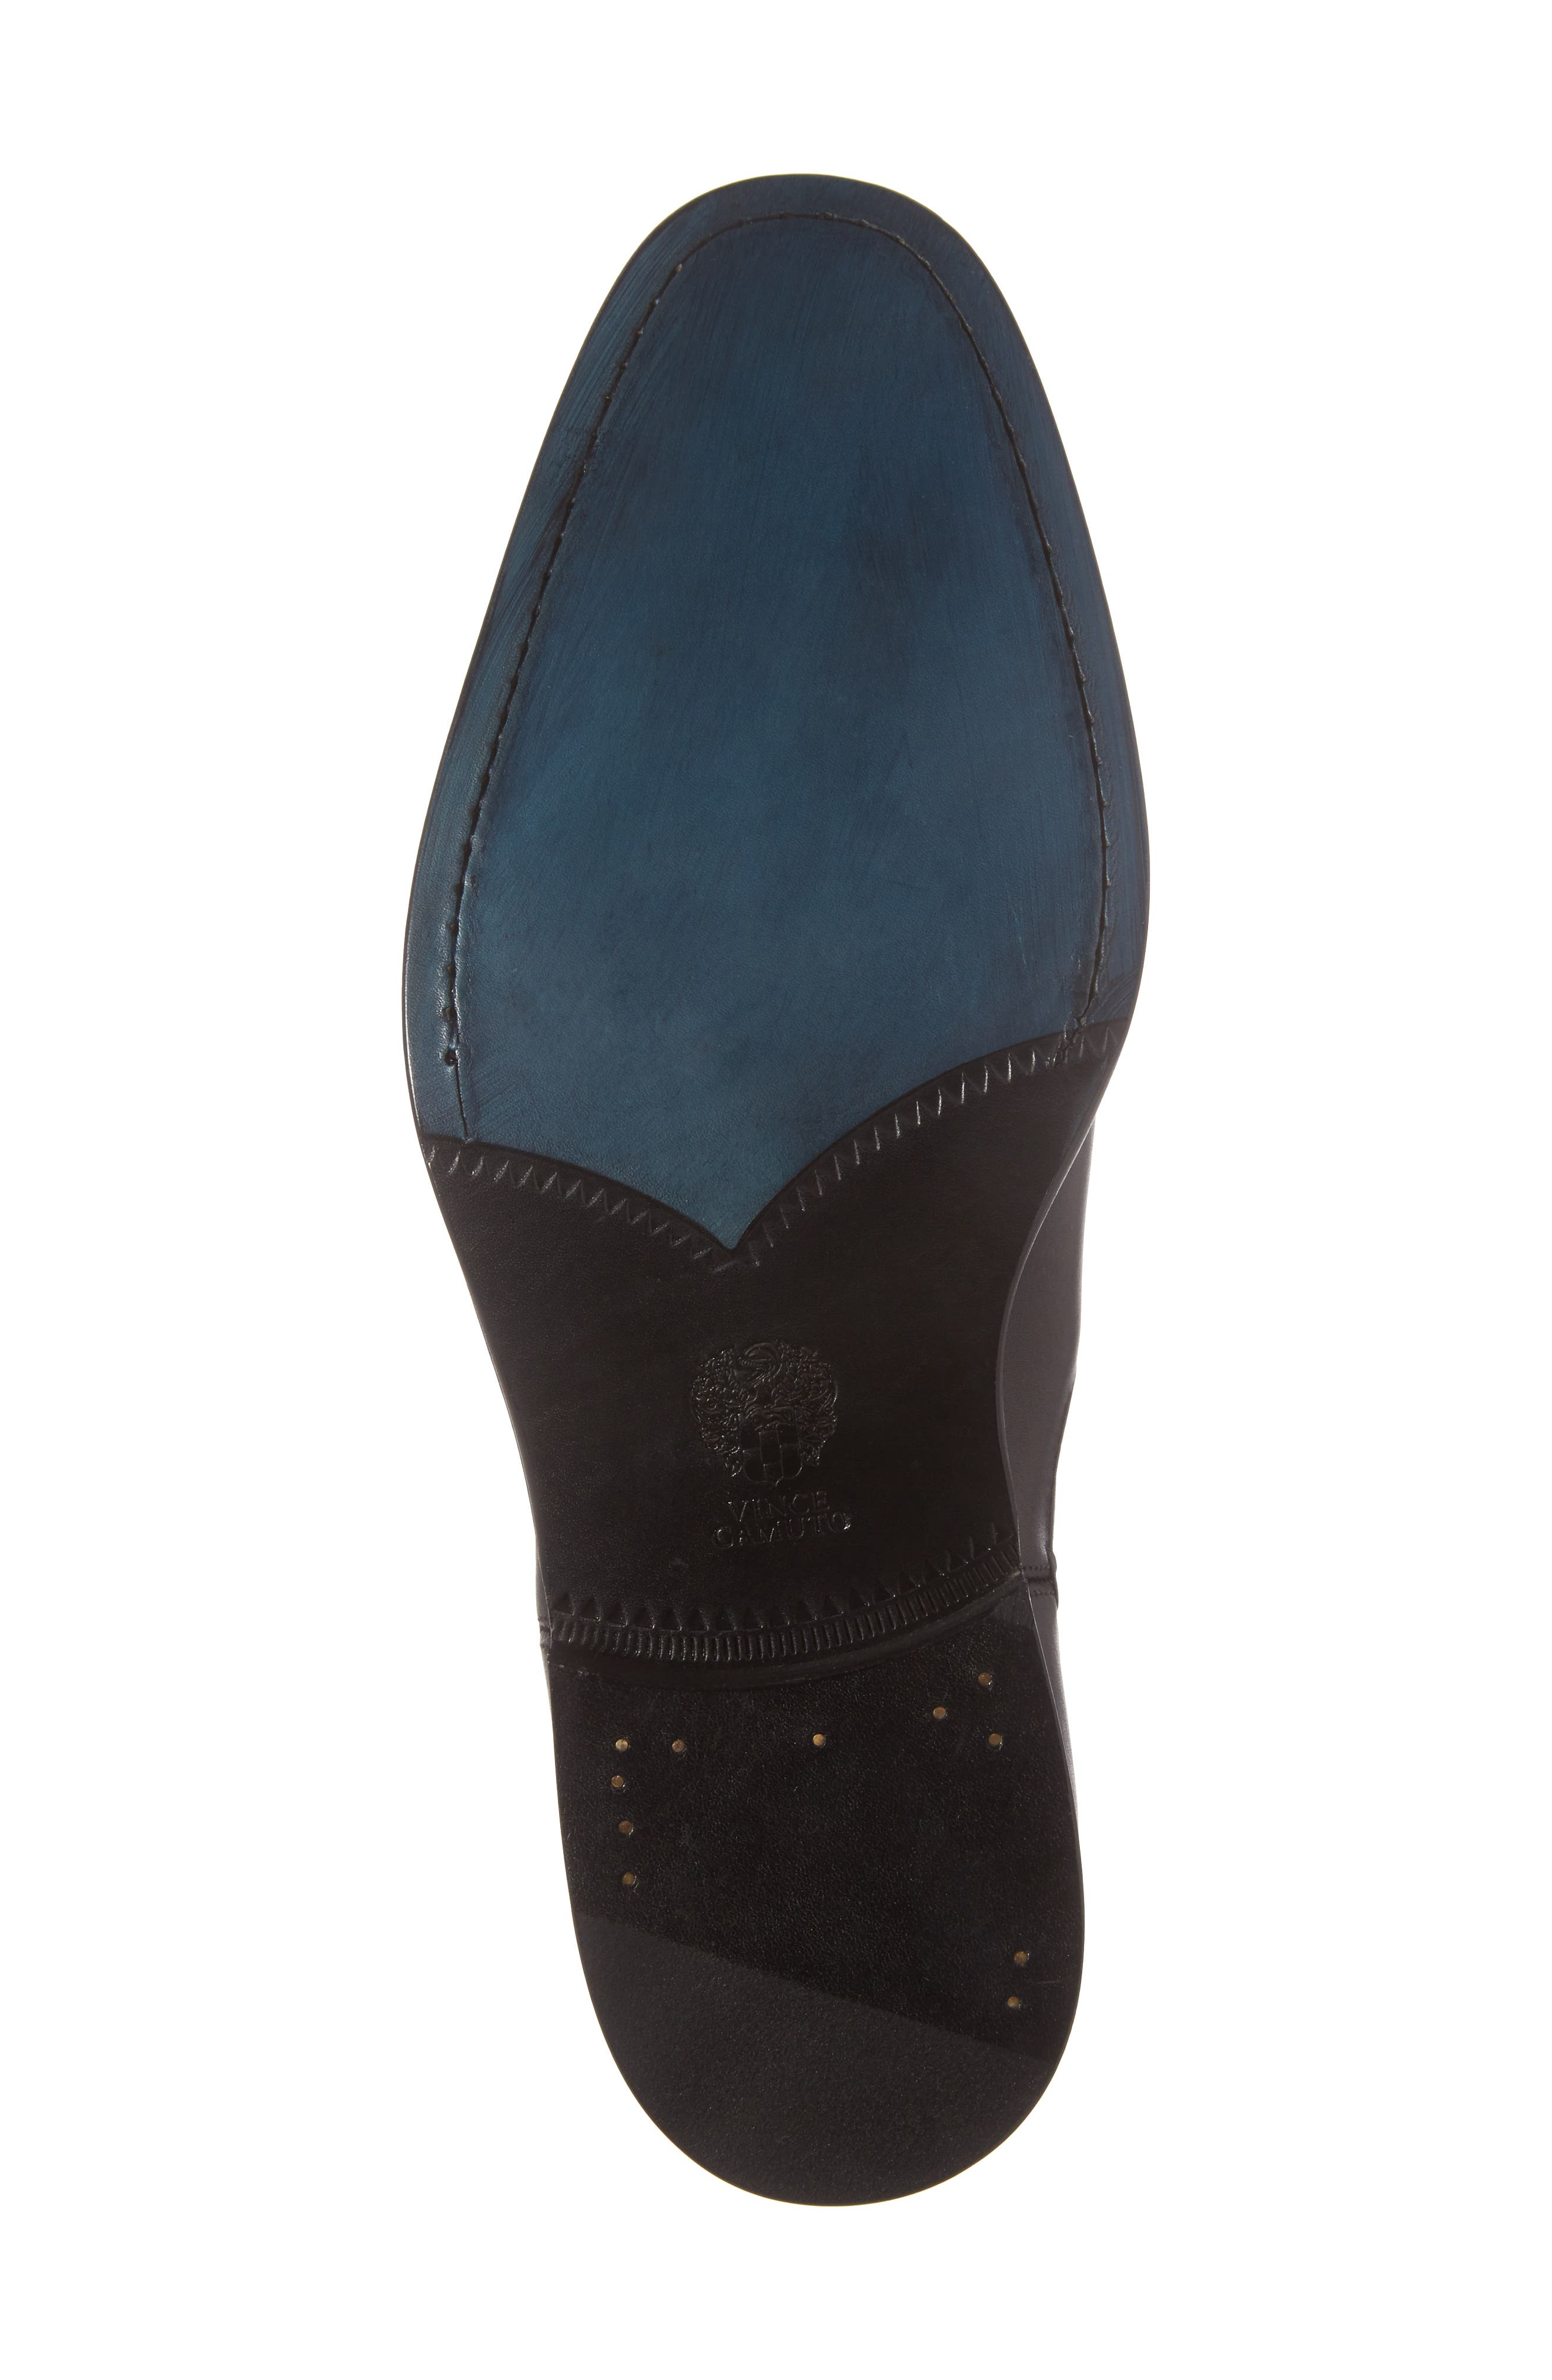 Haldien Chelsea Boot,                             Alternate thumbnail 6, color,                             Black Leather/ Elastic